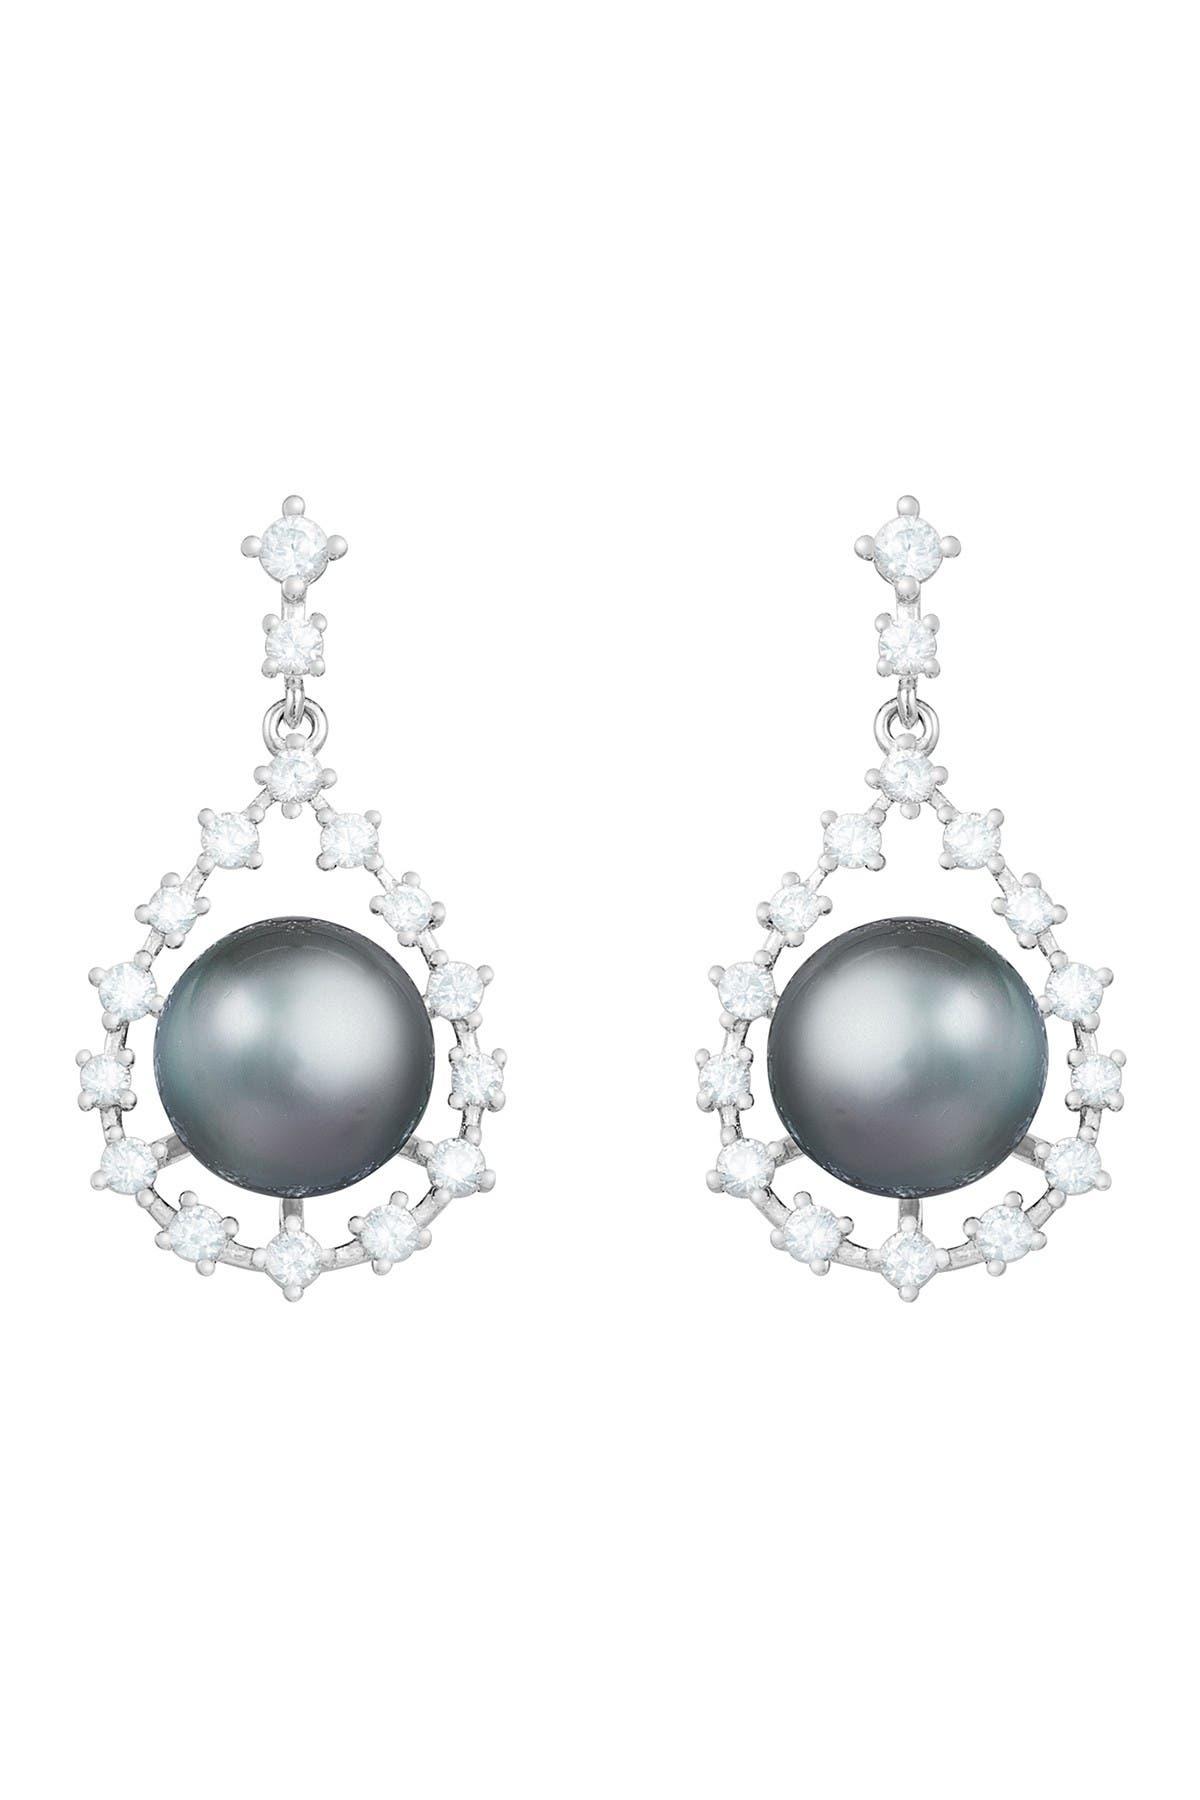 Splendid Pearls Sterling Silver 9-10mm Black Tahitian Pearl CZ Drop Earrings